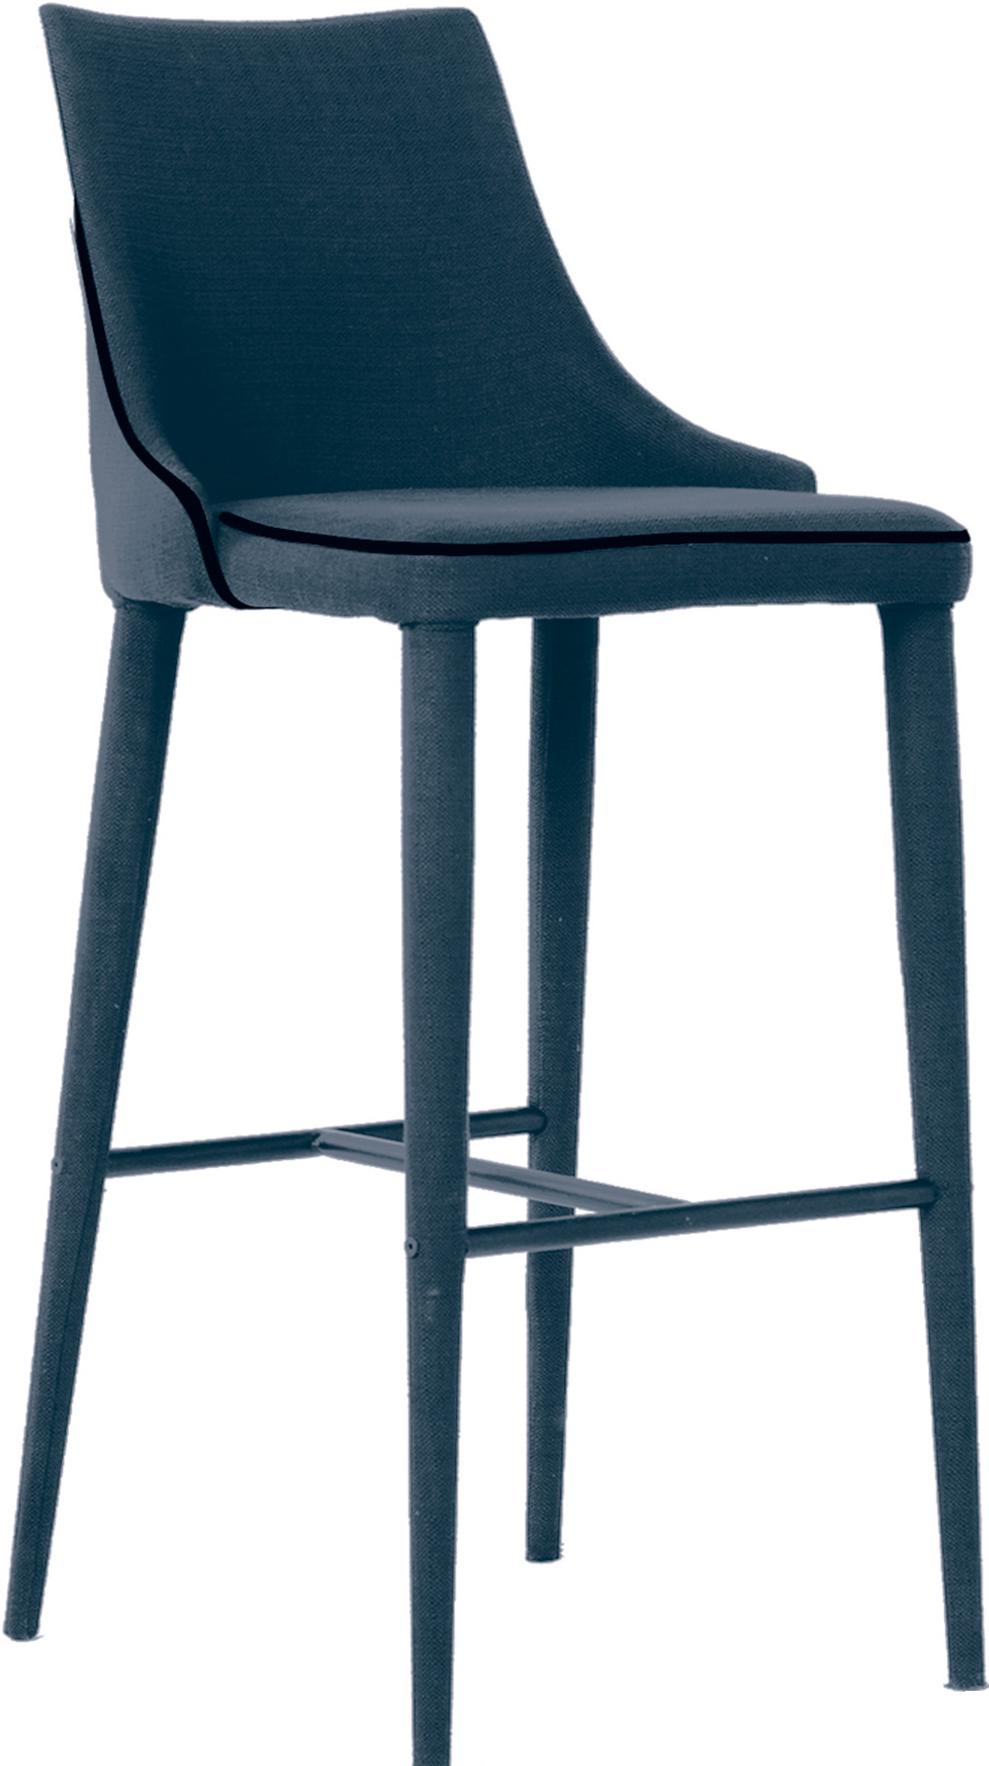 Chanel stool